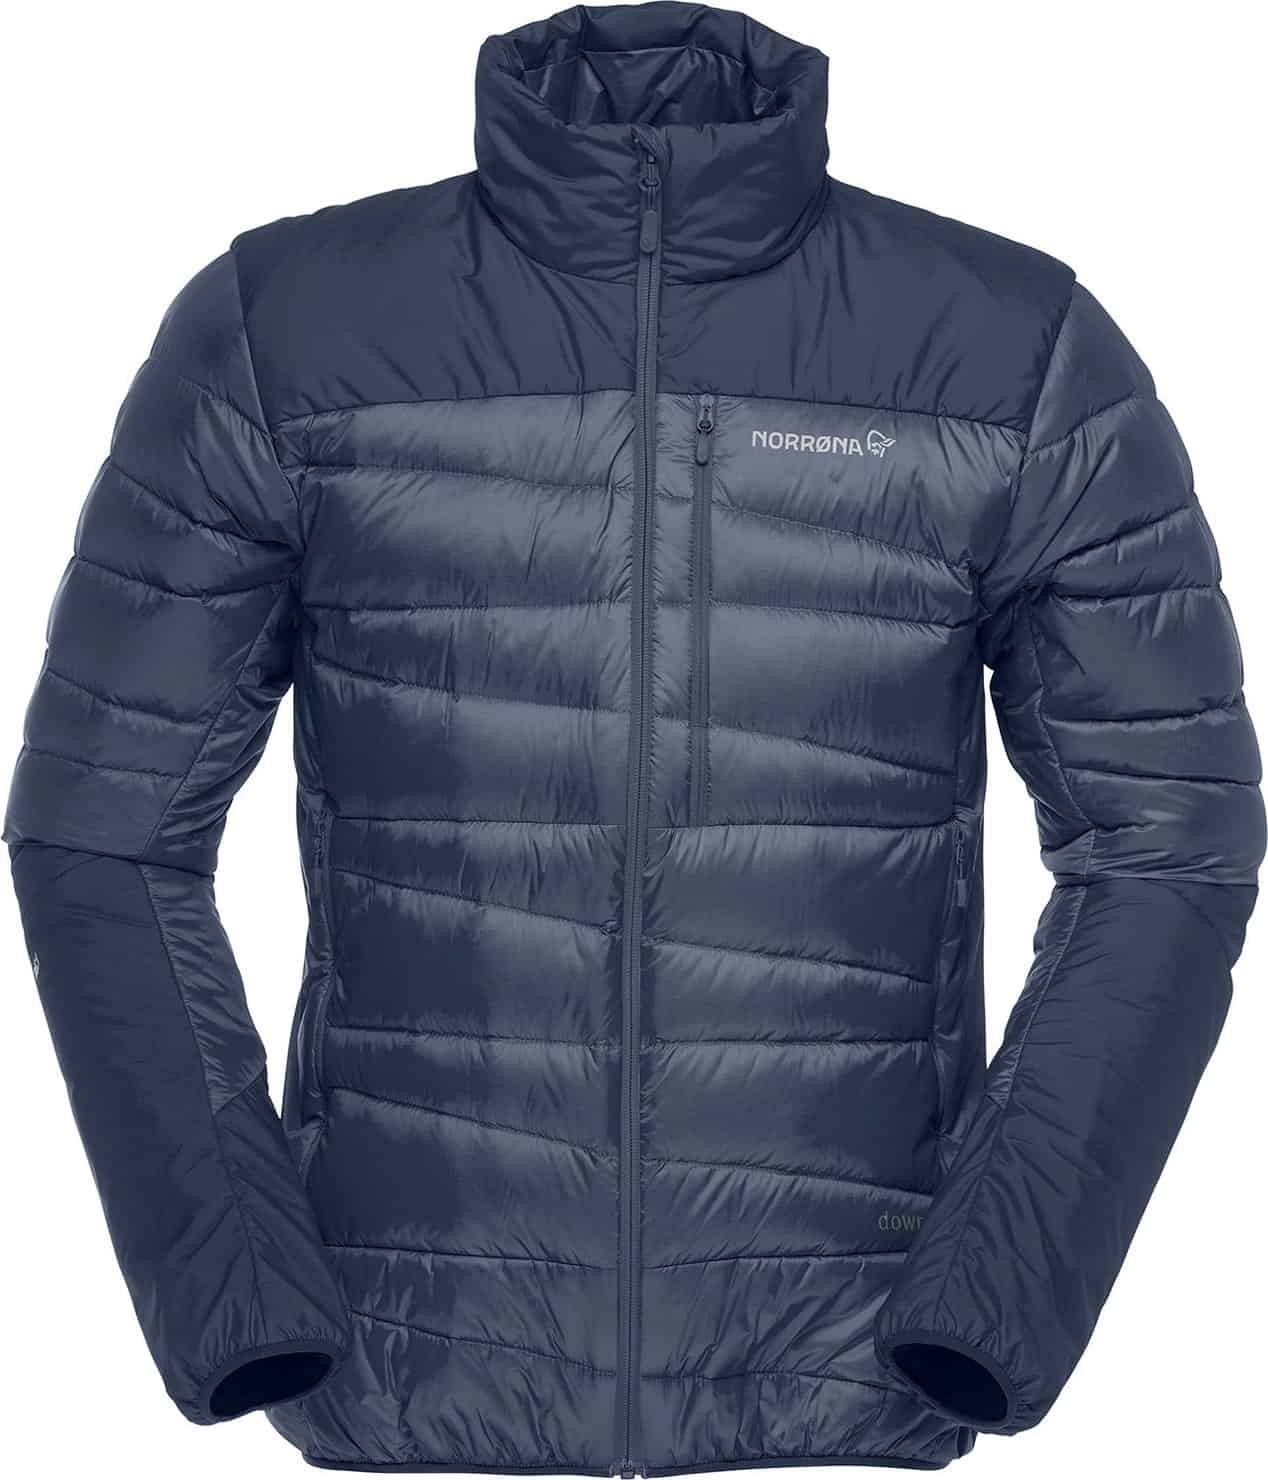 1ed4b9c0f Fleece VS Down VS Merino Wool; The Ultimate Mid-Layer Face-Off